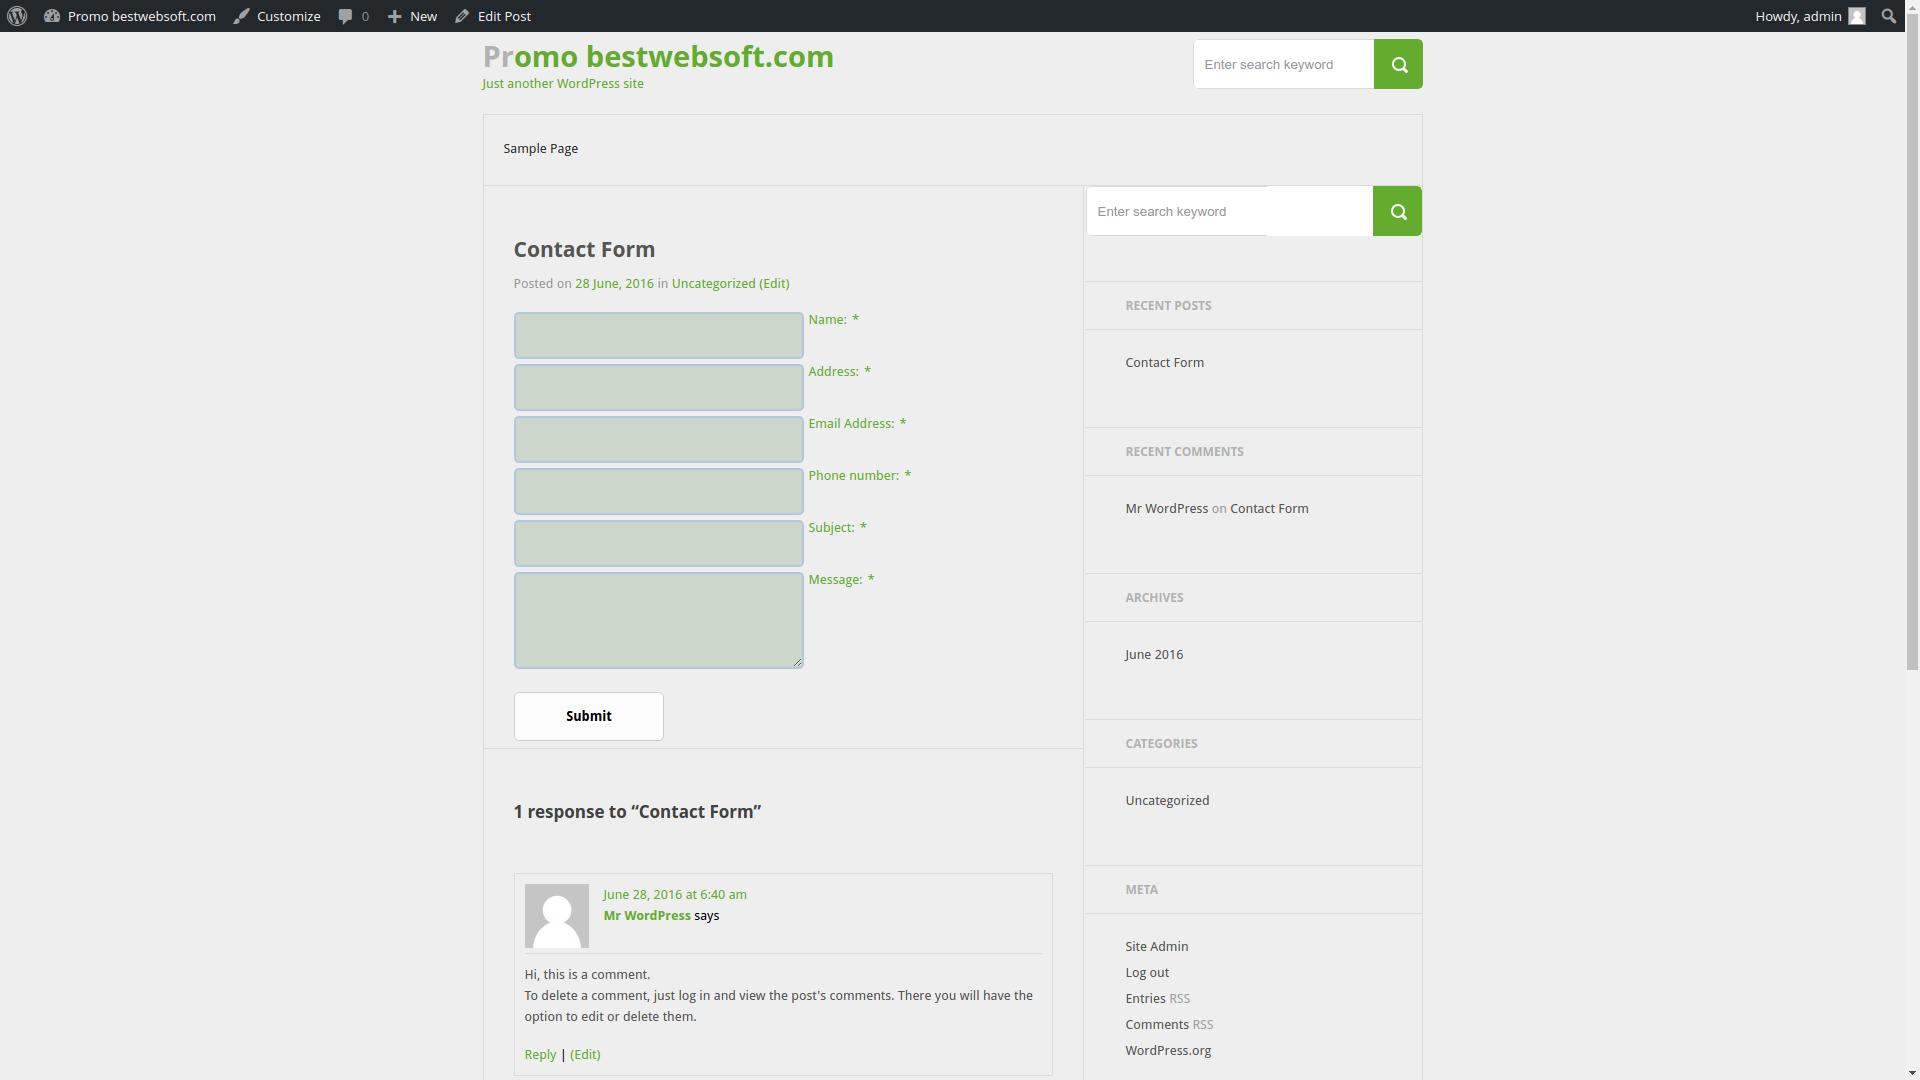 contact form screenshot 10